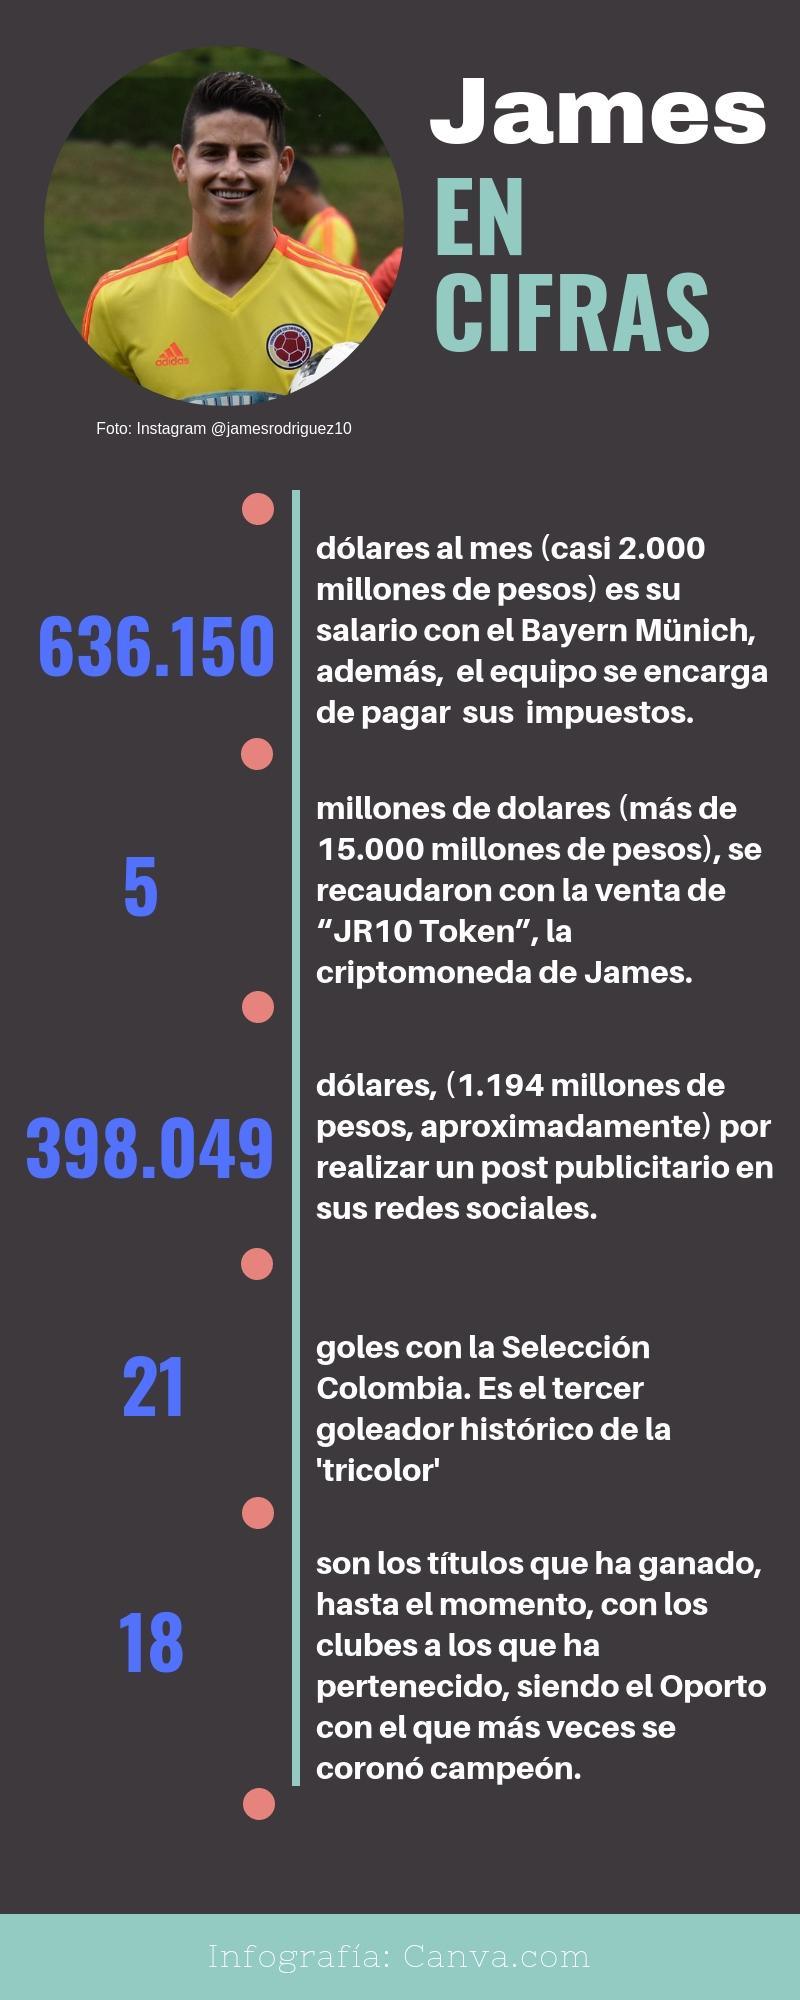 info-james-cifras